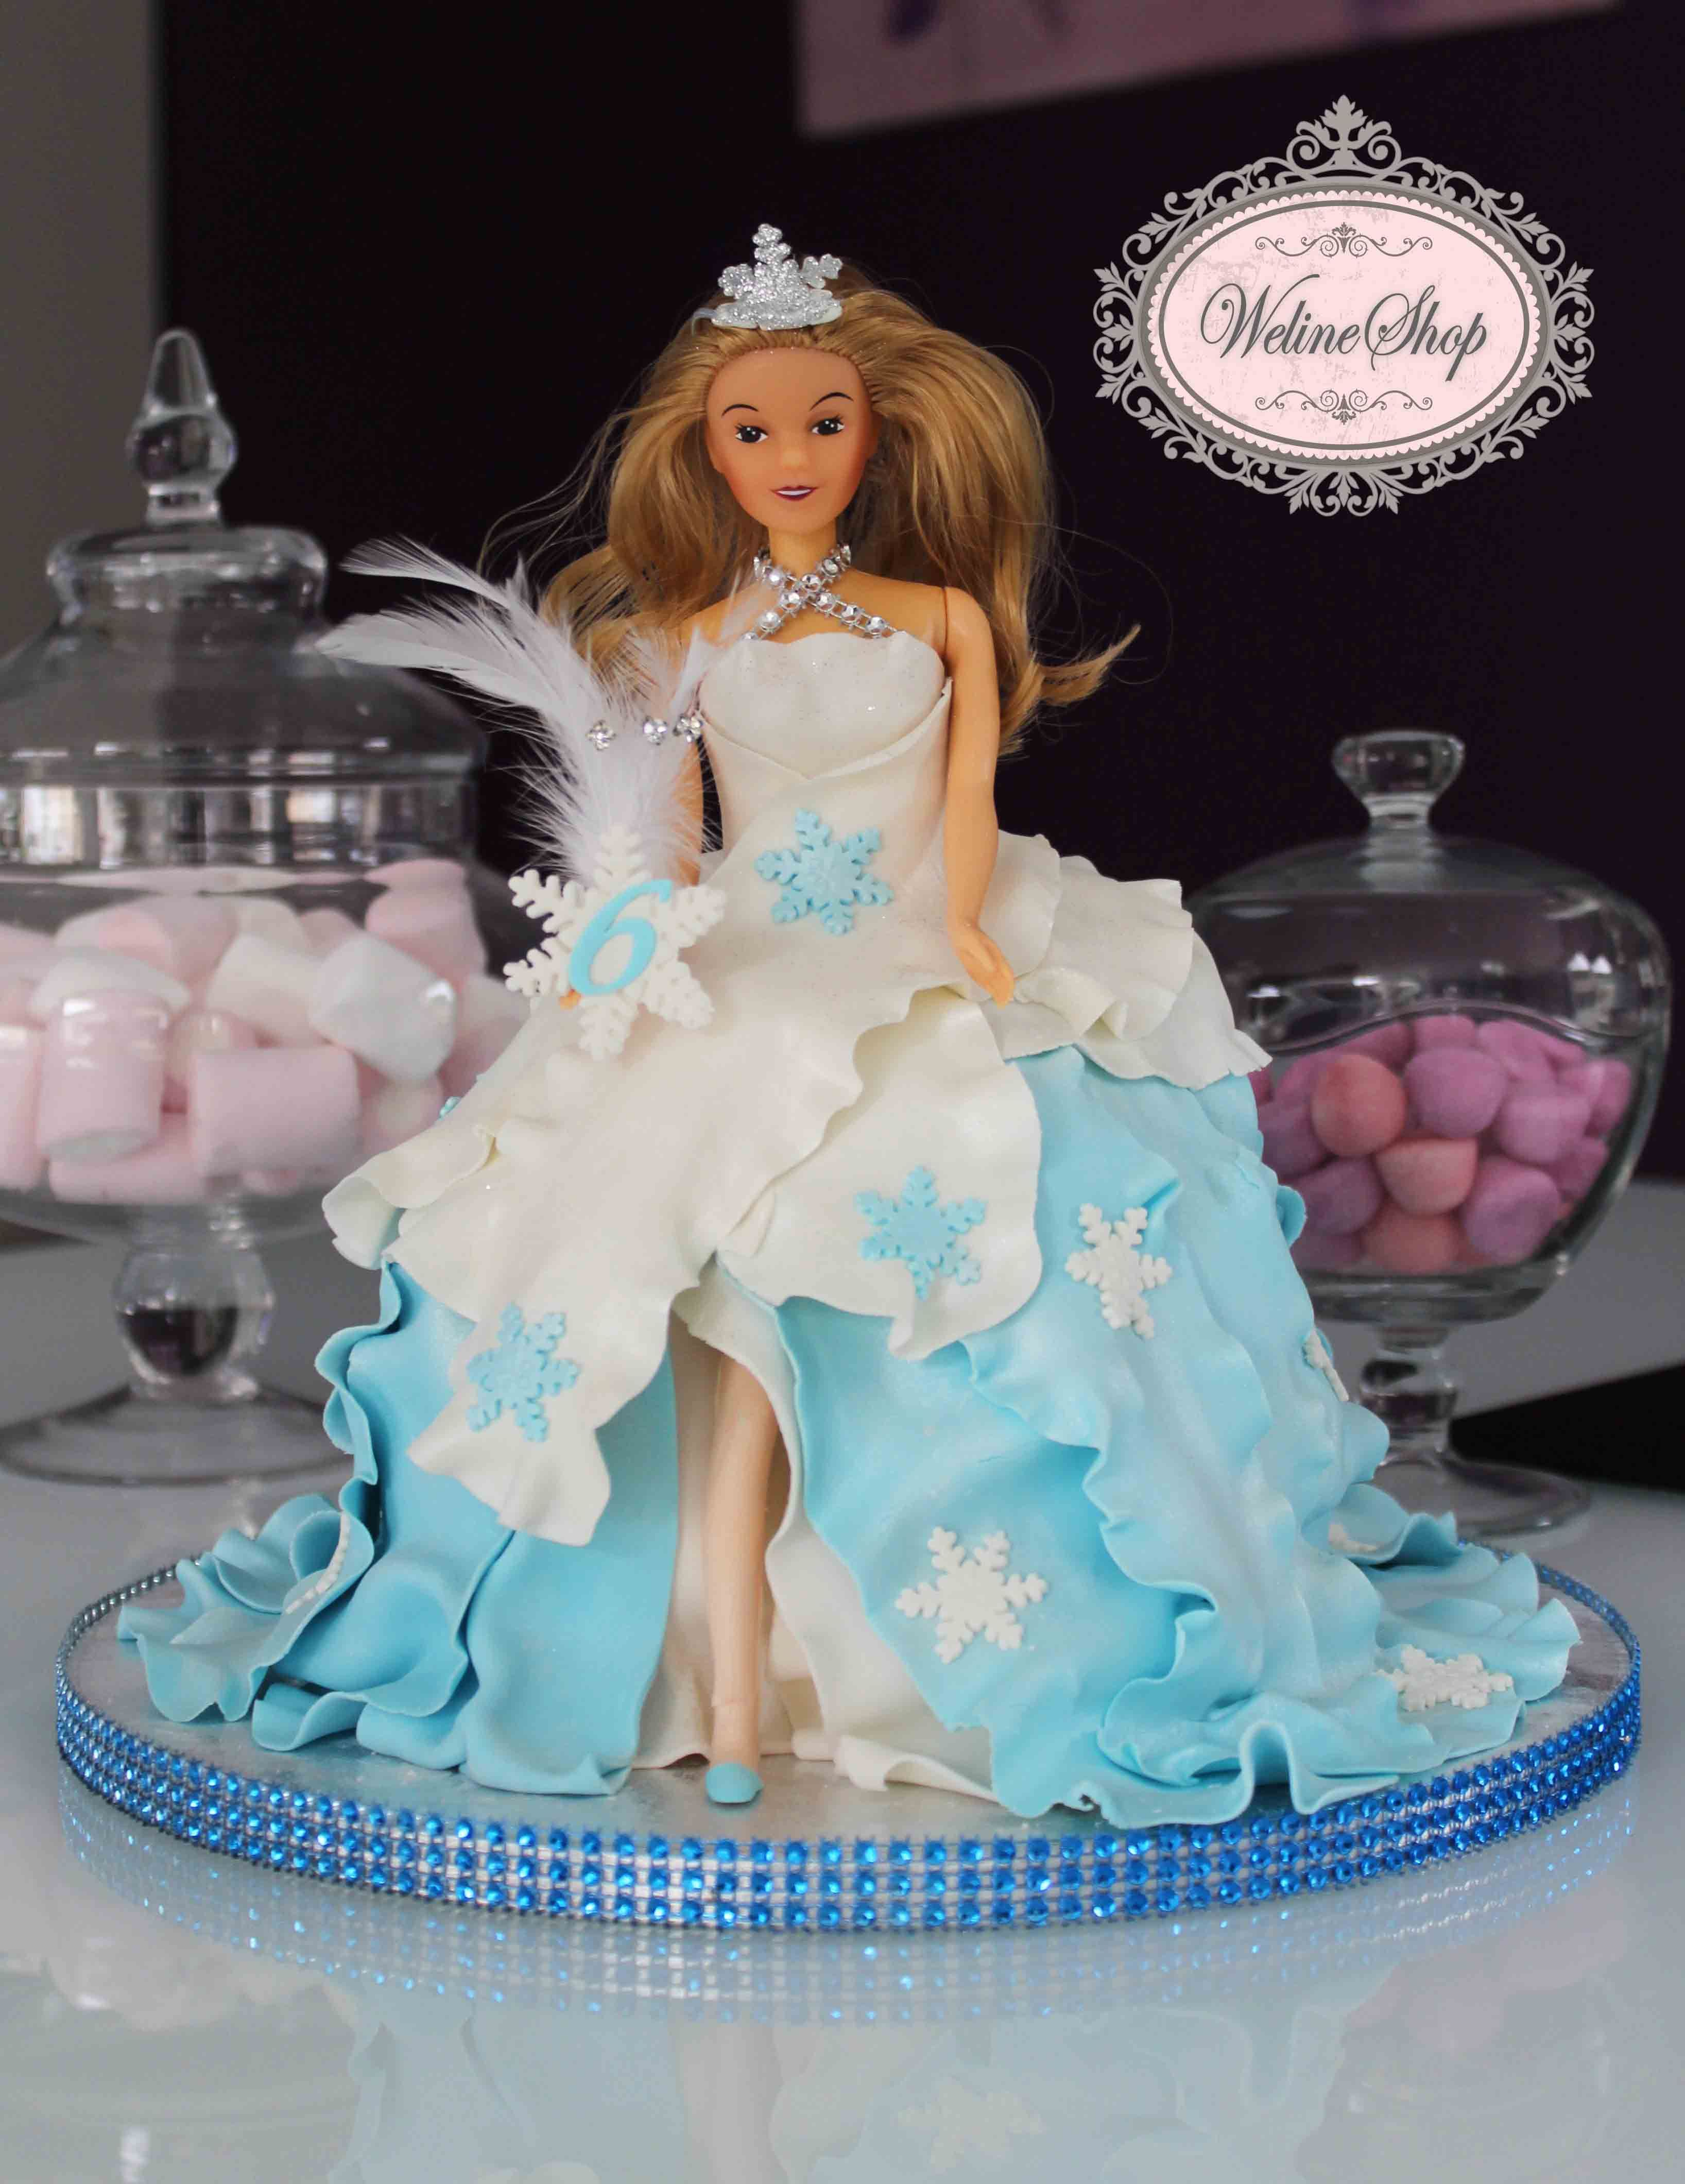 weline shop gteau barbie reine des neige - Barbie La Reine Des Neiges